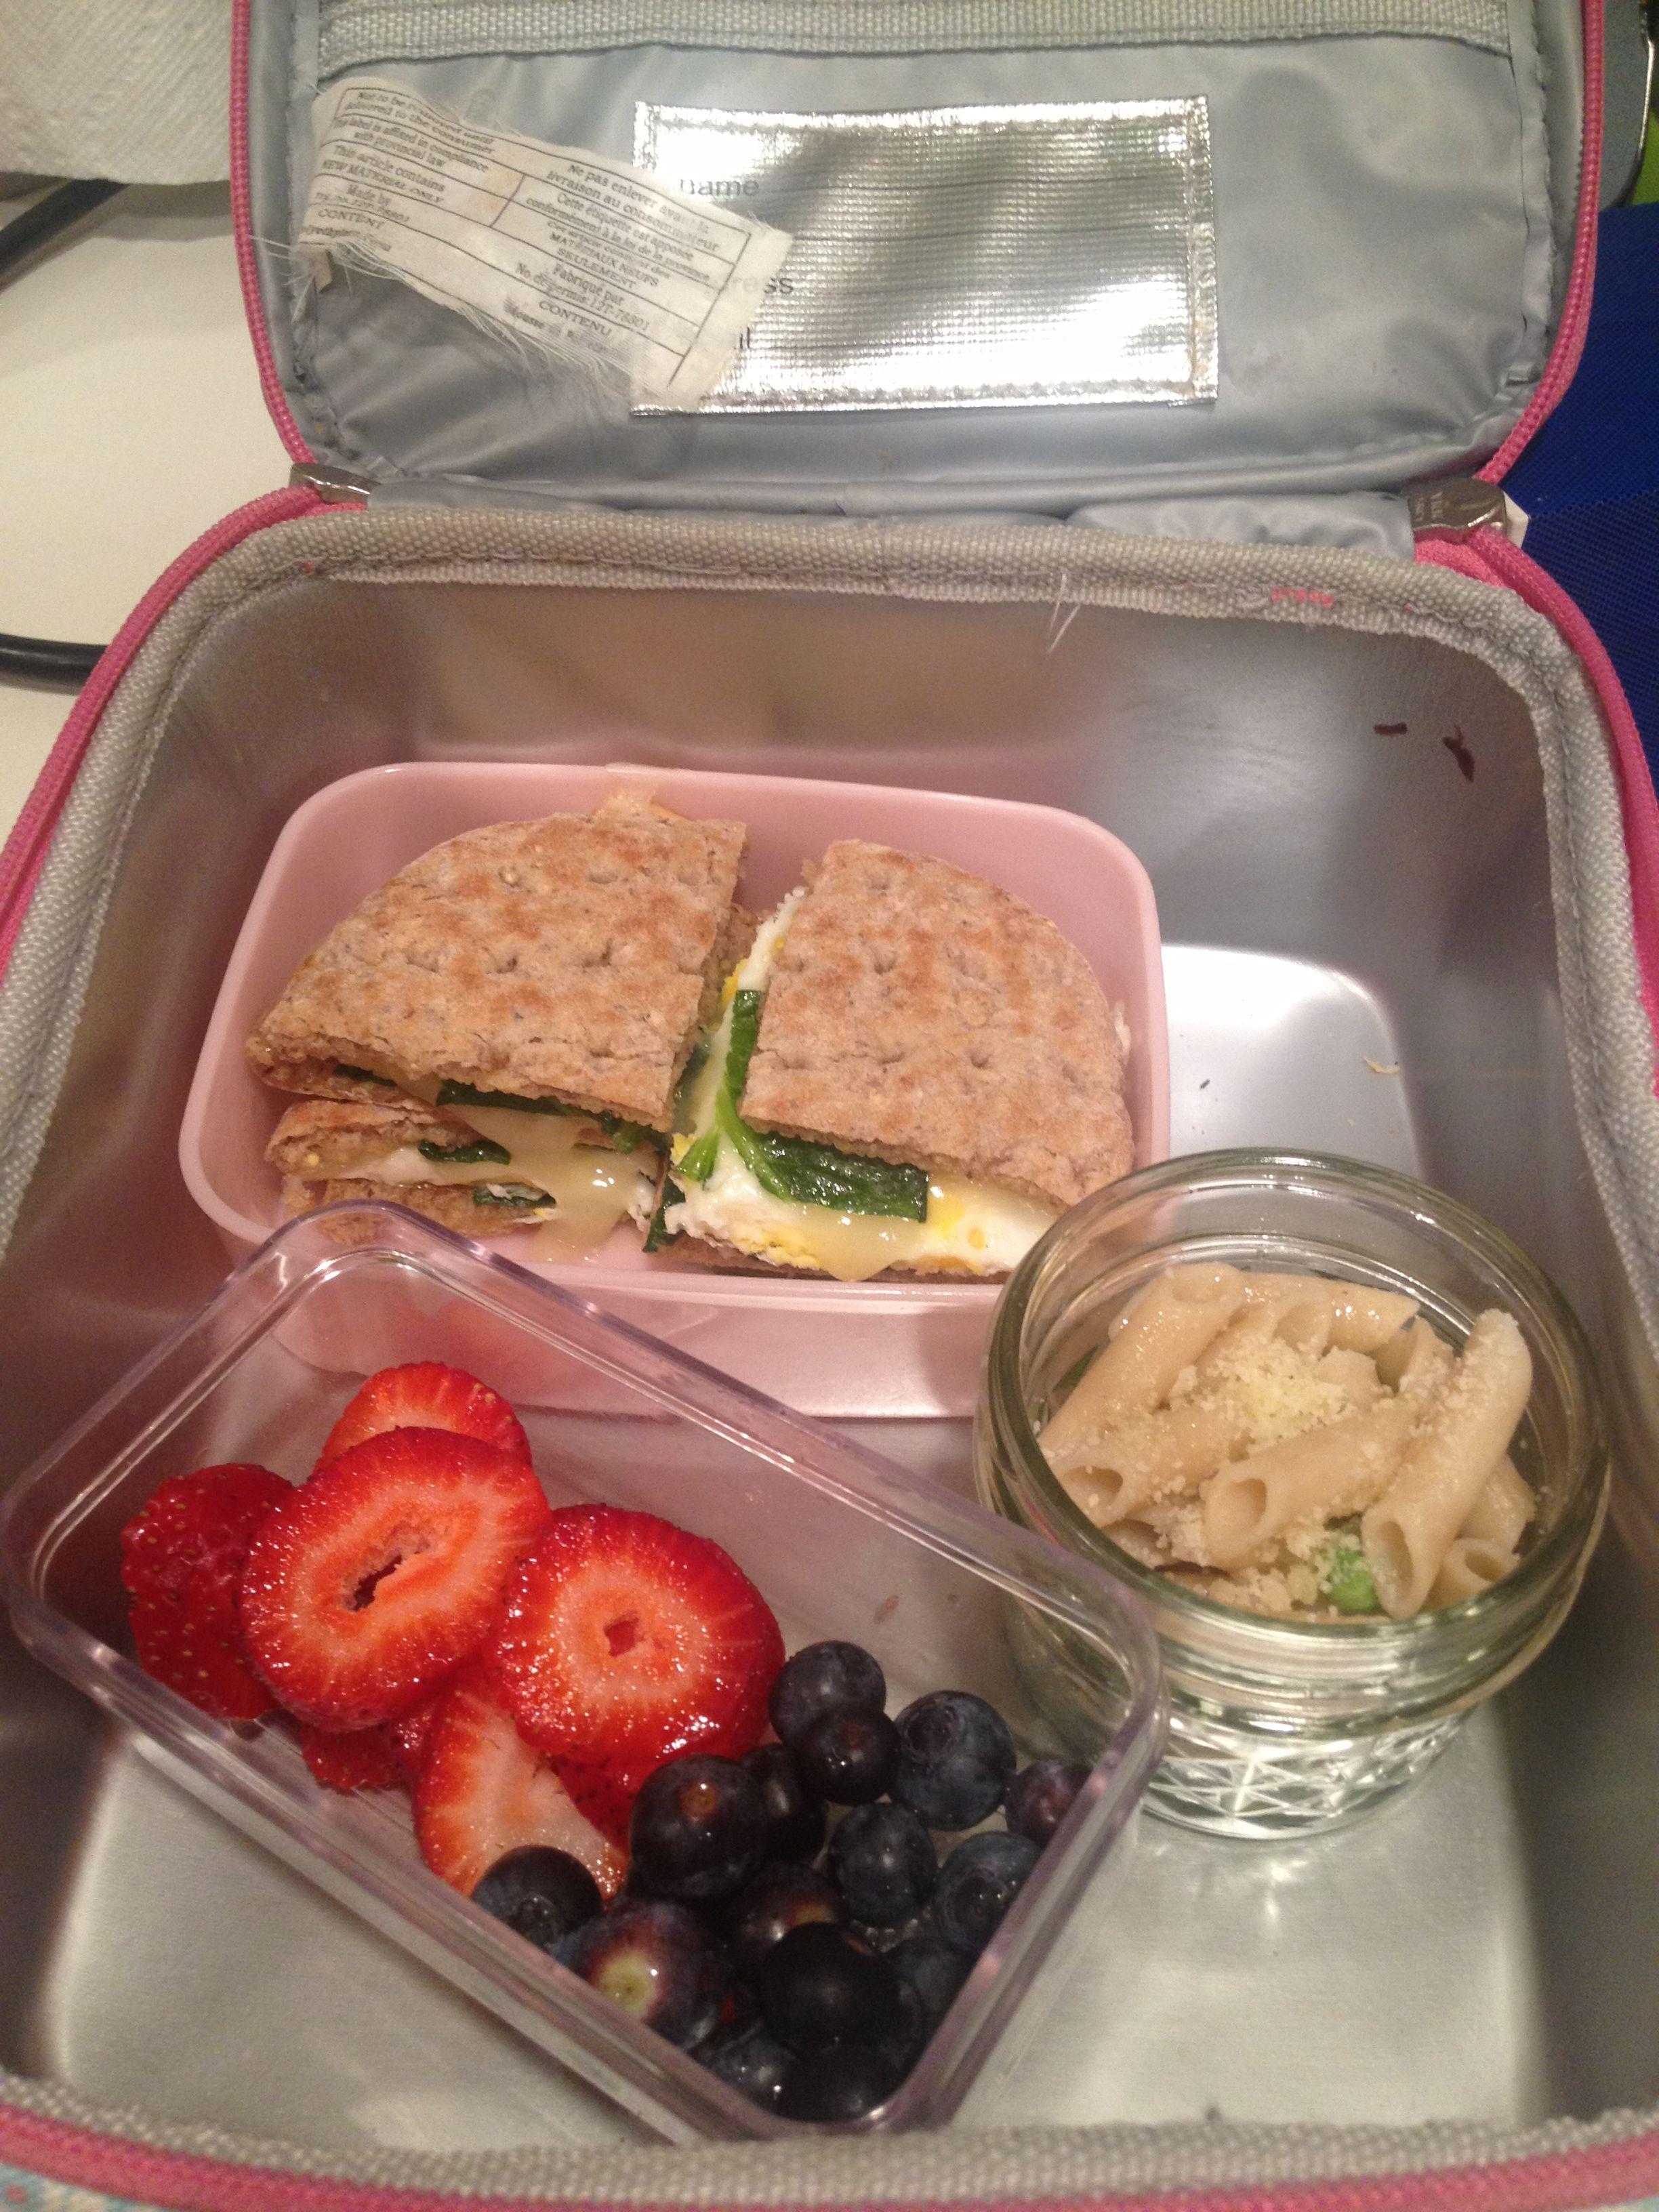 Egg sandwich, fresh berries, and pasta